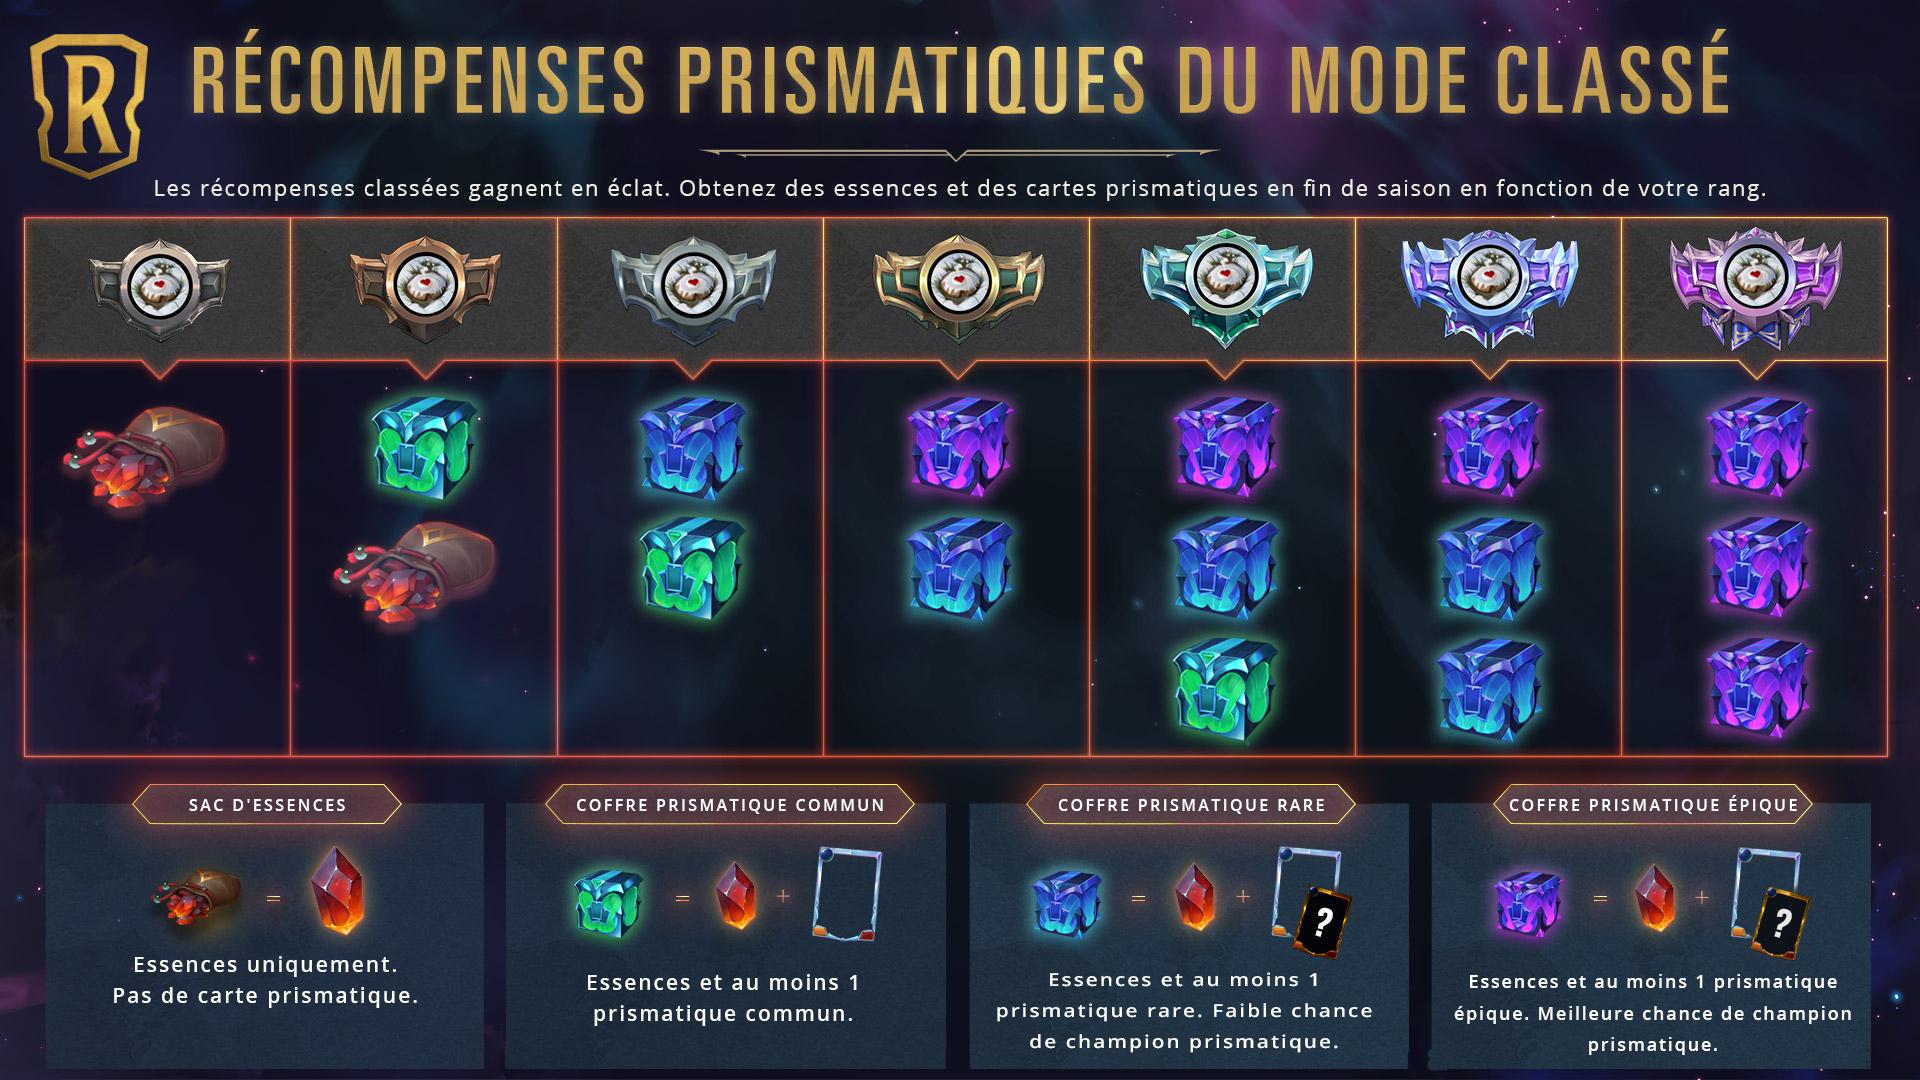 Prismatic_Ranked_Rewards_Modal-fre.jpg